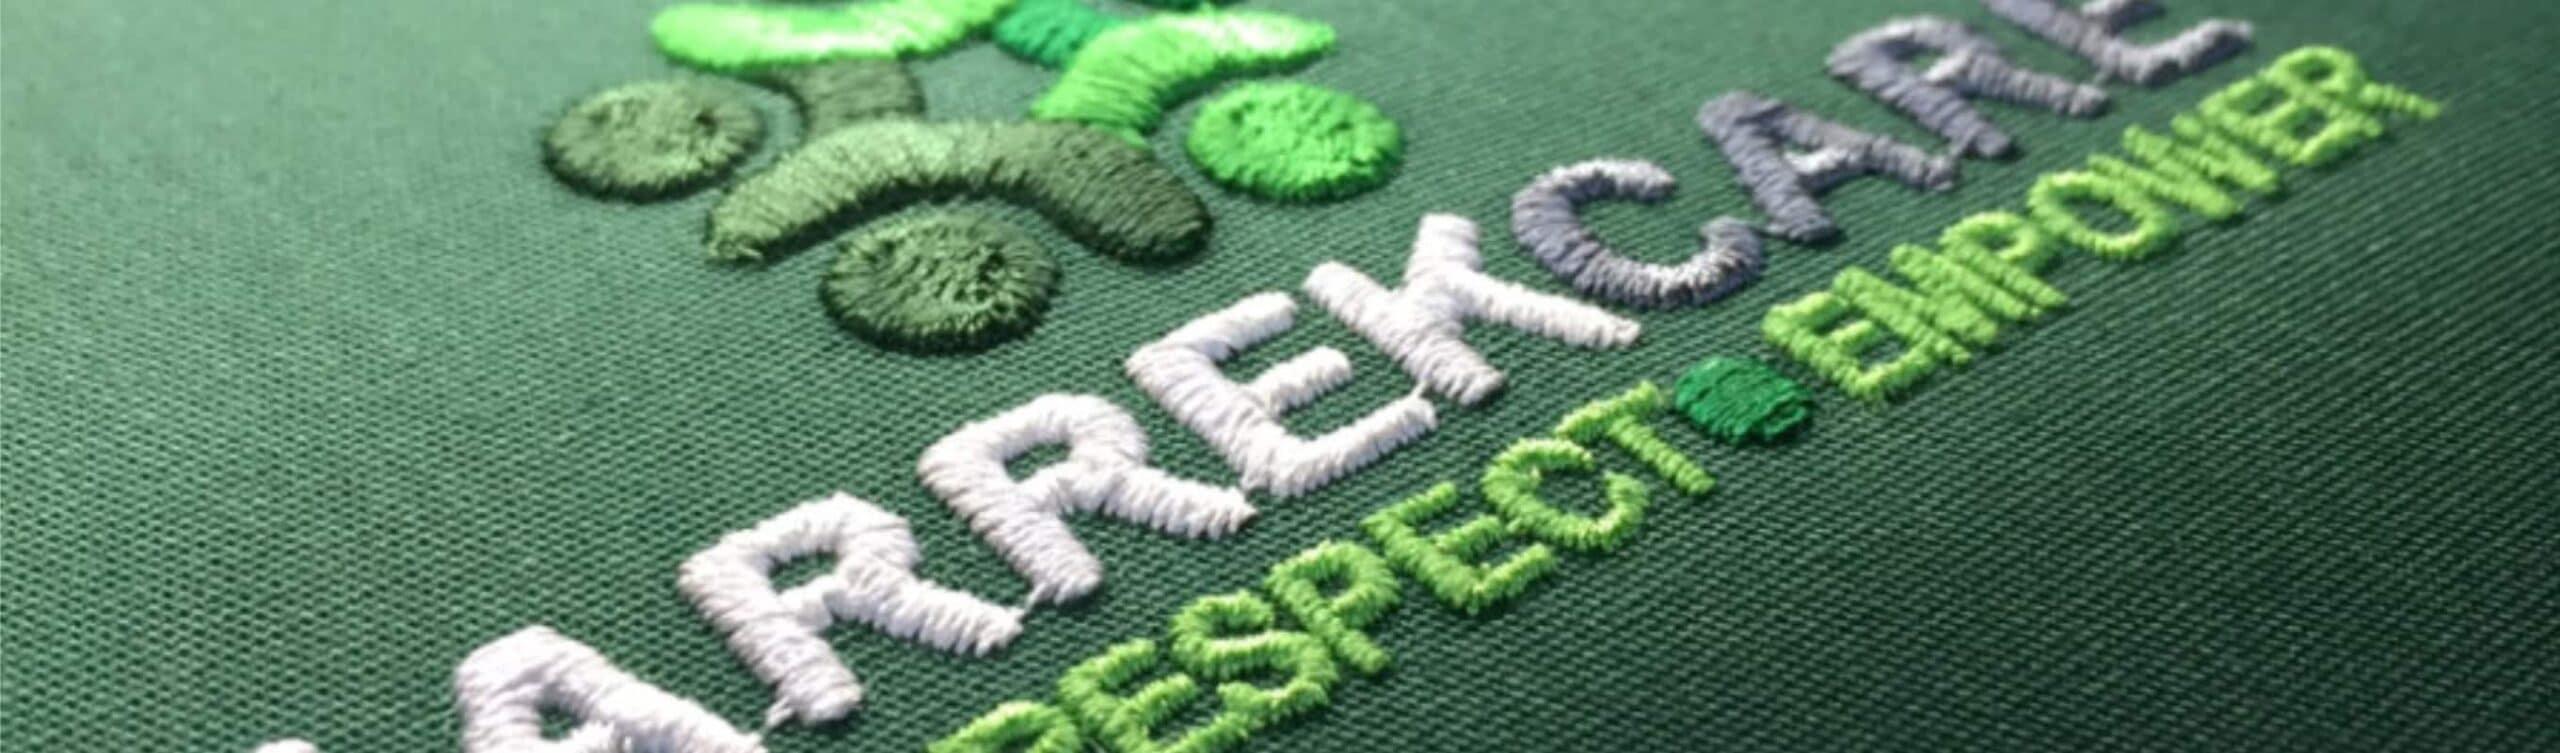 Embroidery-karrek